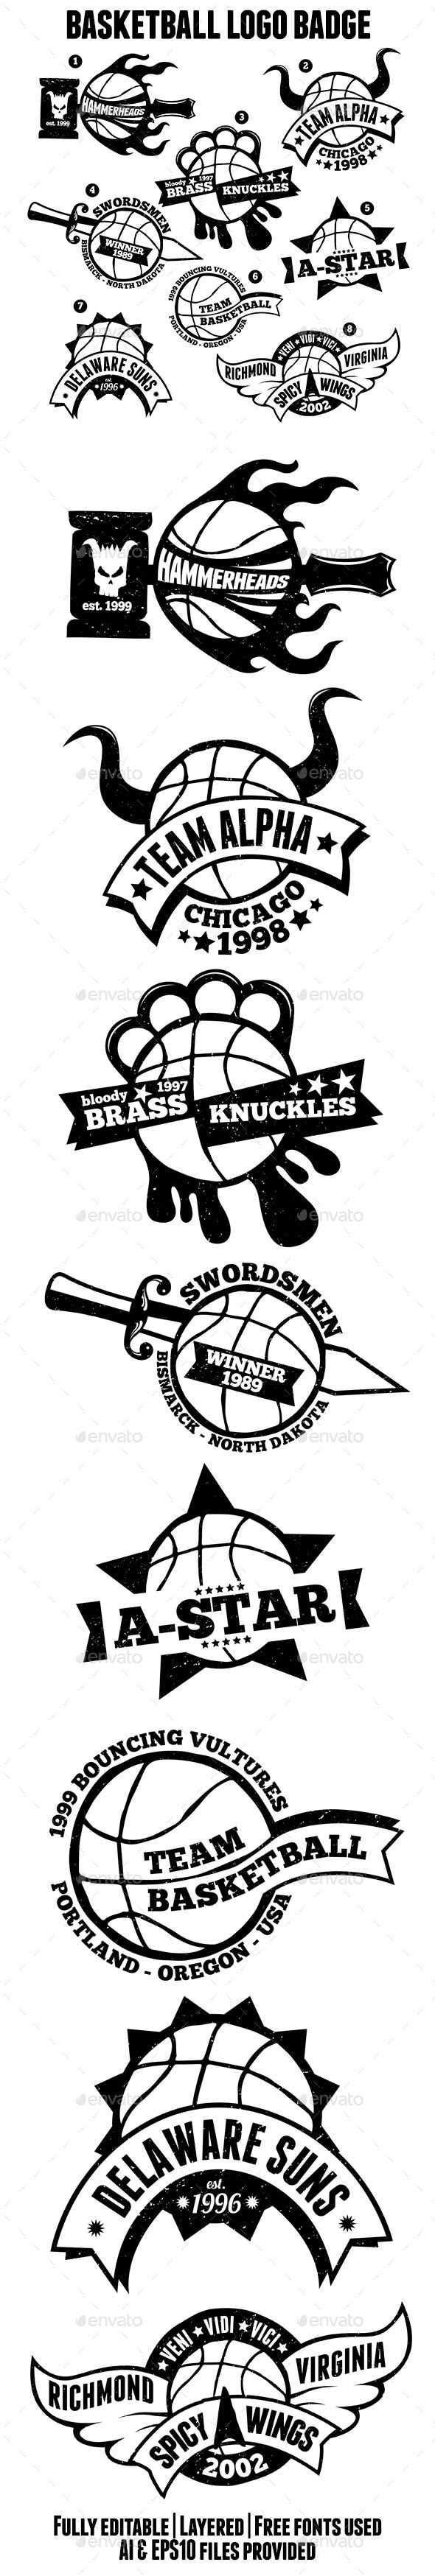 Basketball Logo Badges - Badges & Stickers Web Elements